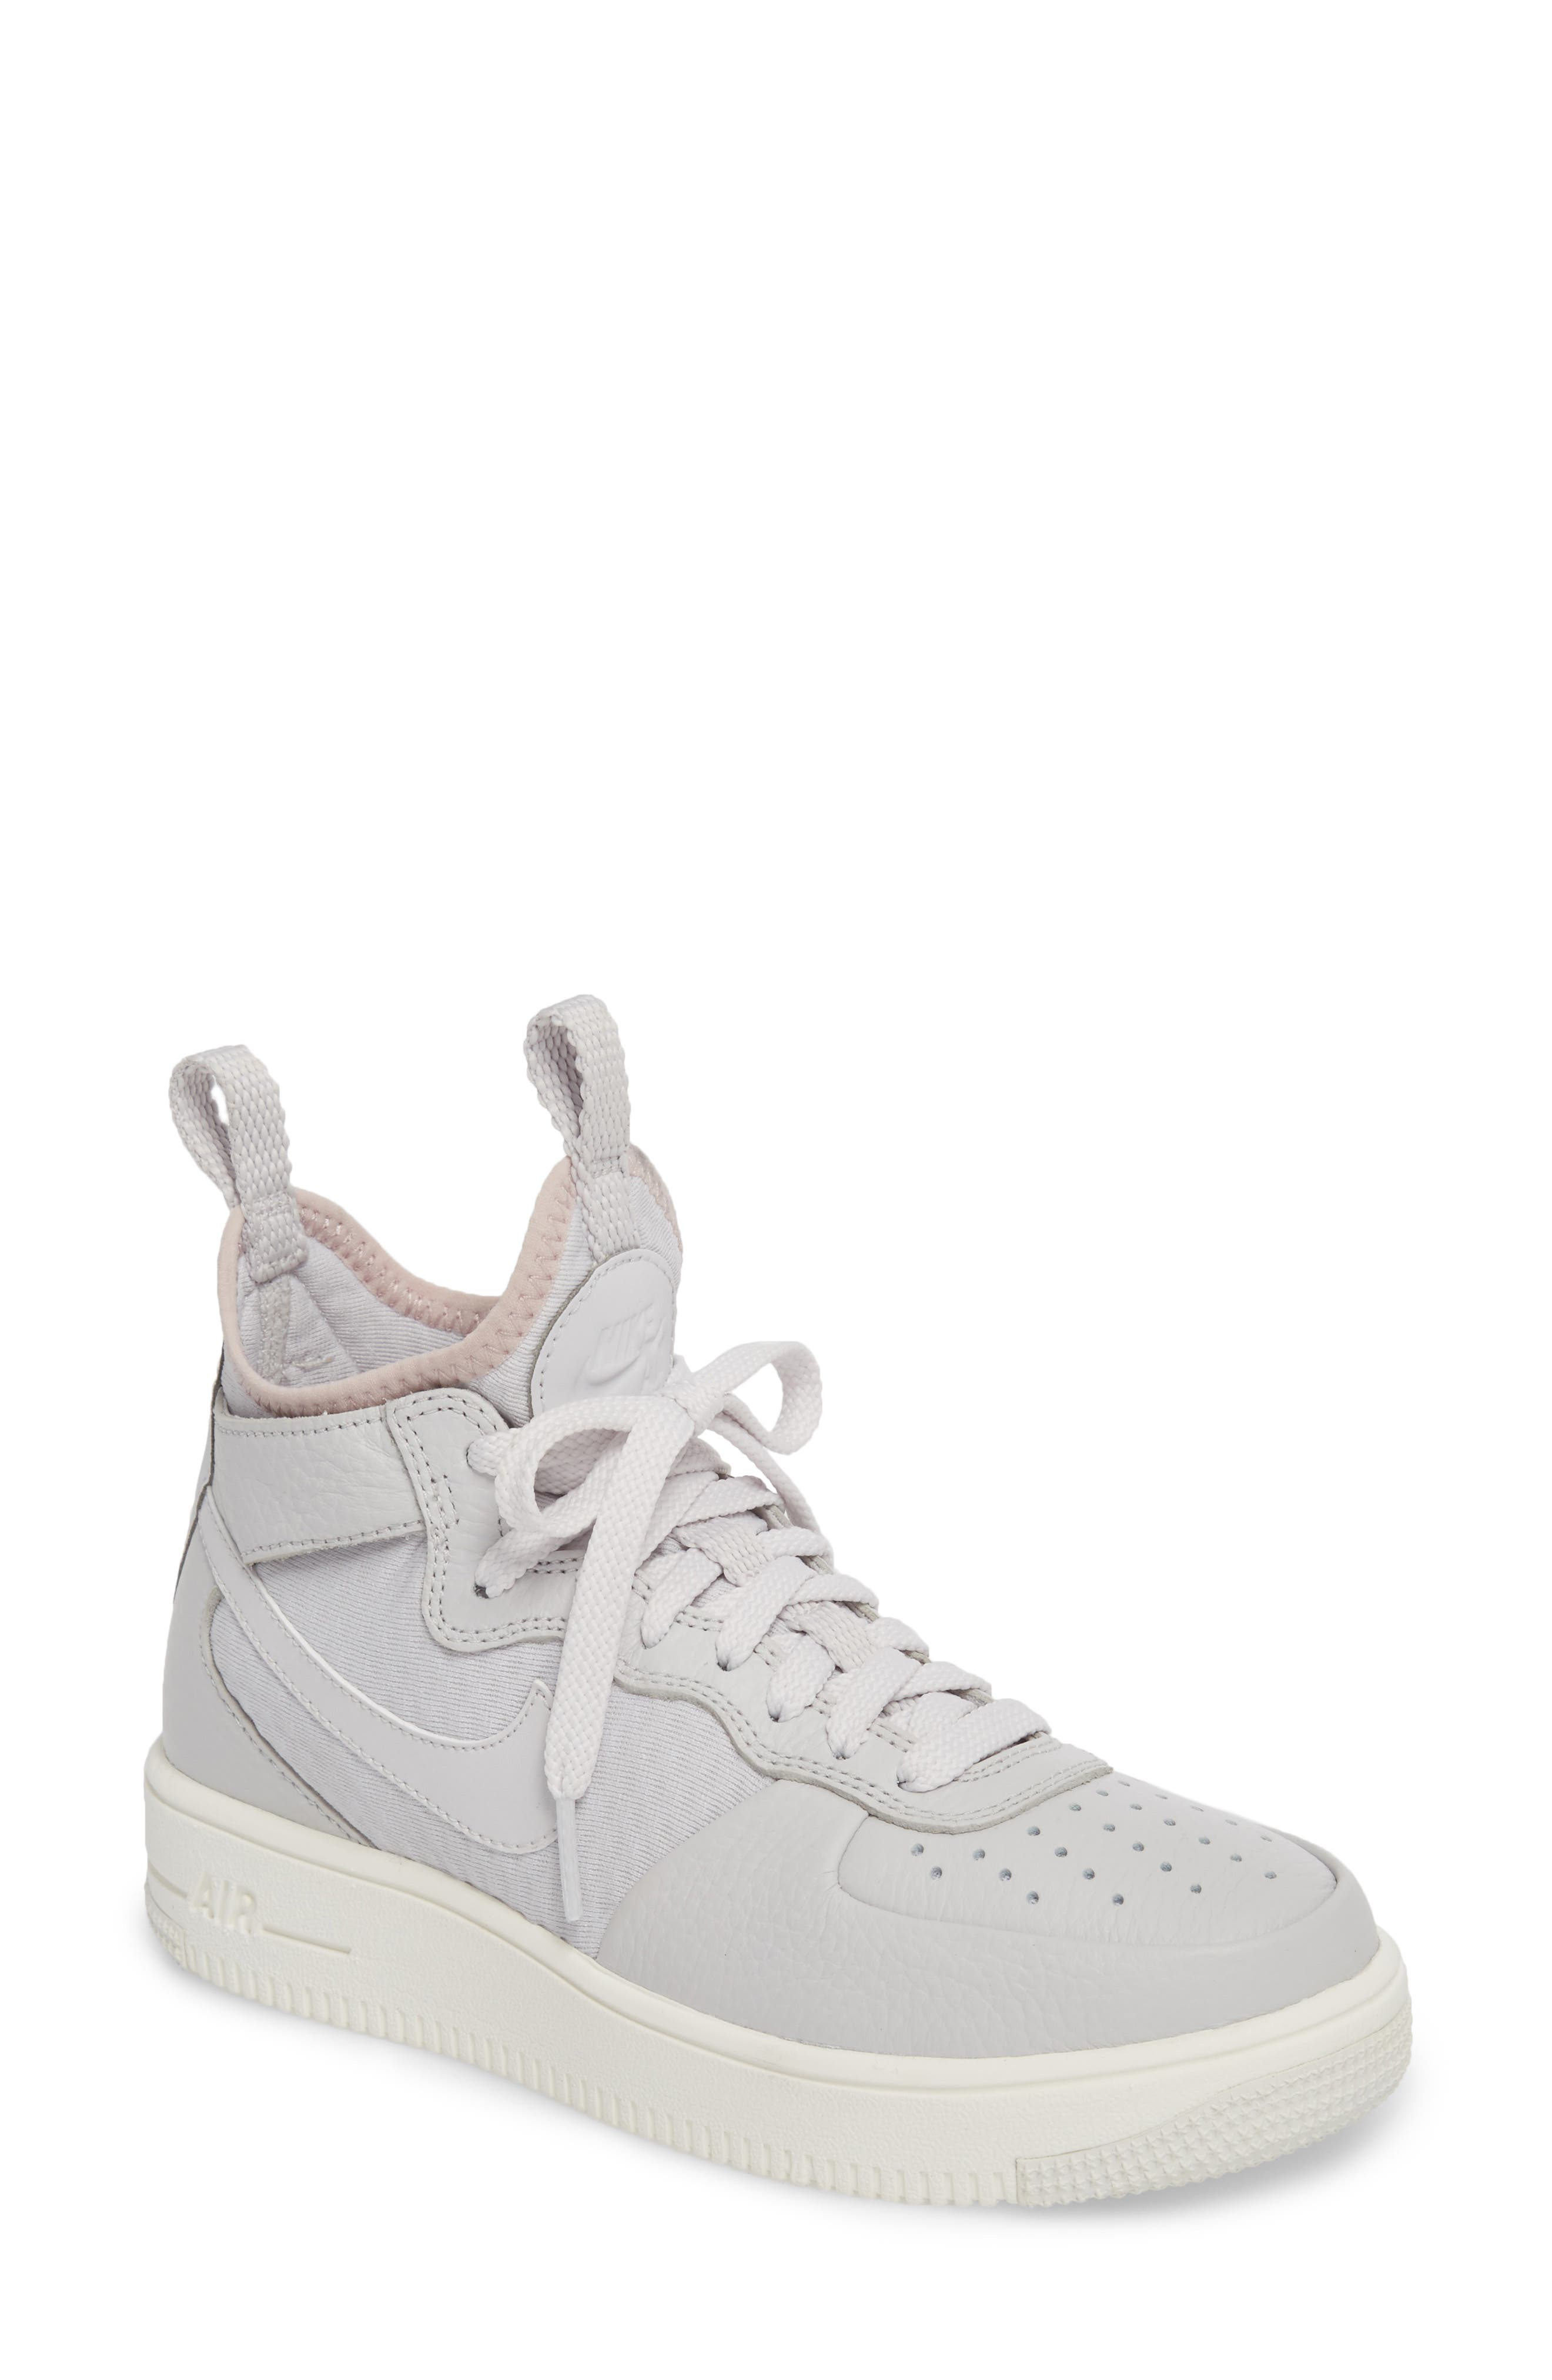 Air Force 1 Ultraforce Mid Sneaker,                             Main thumbnail 2, color,